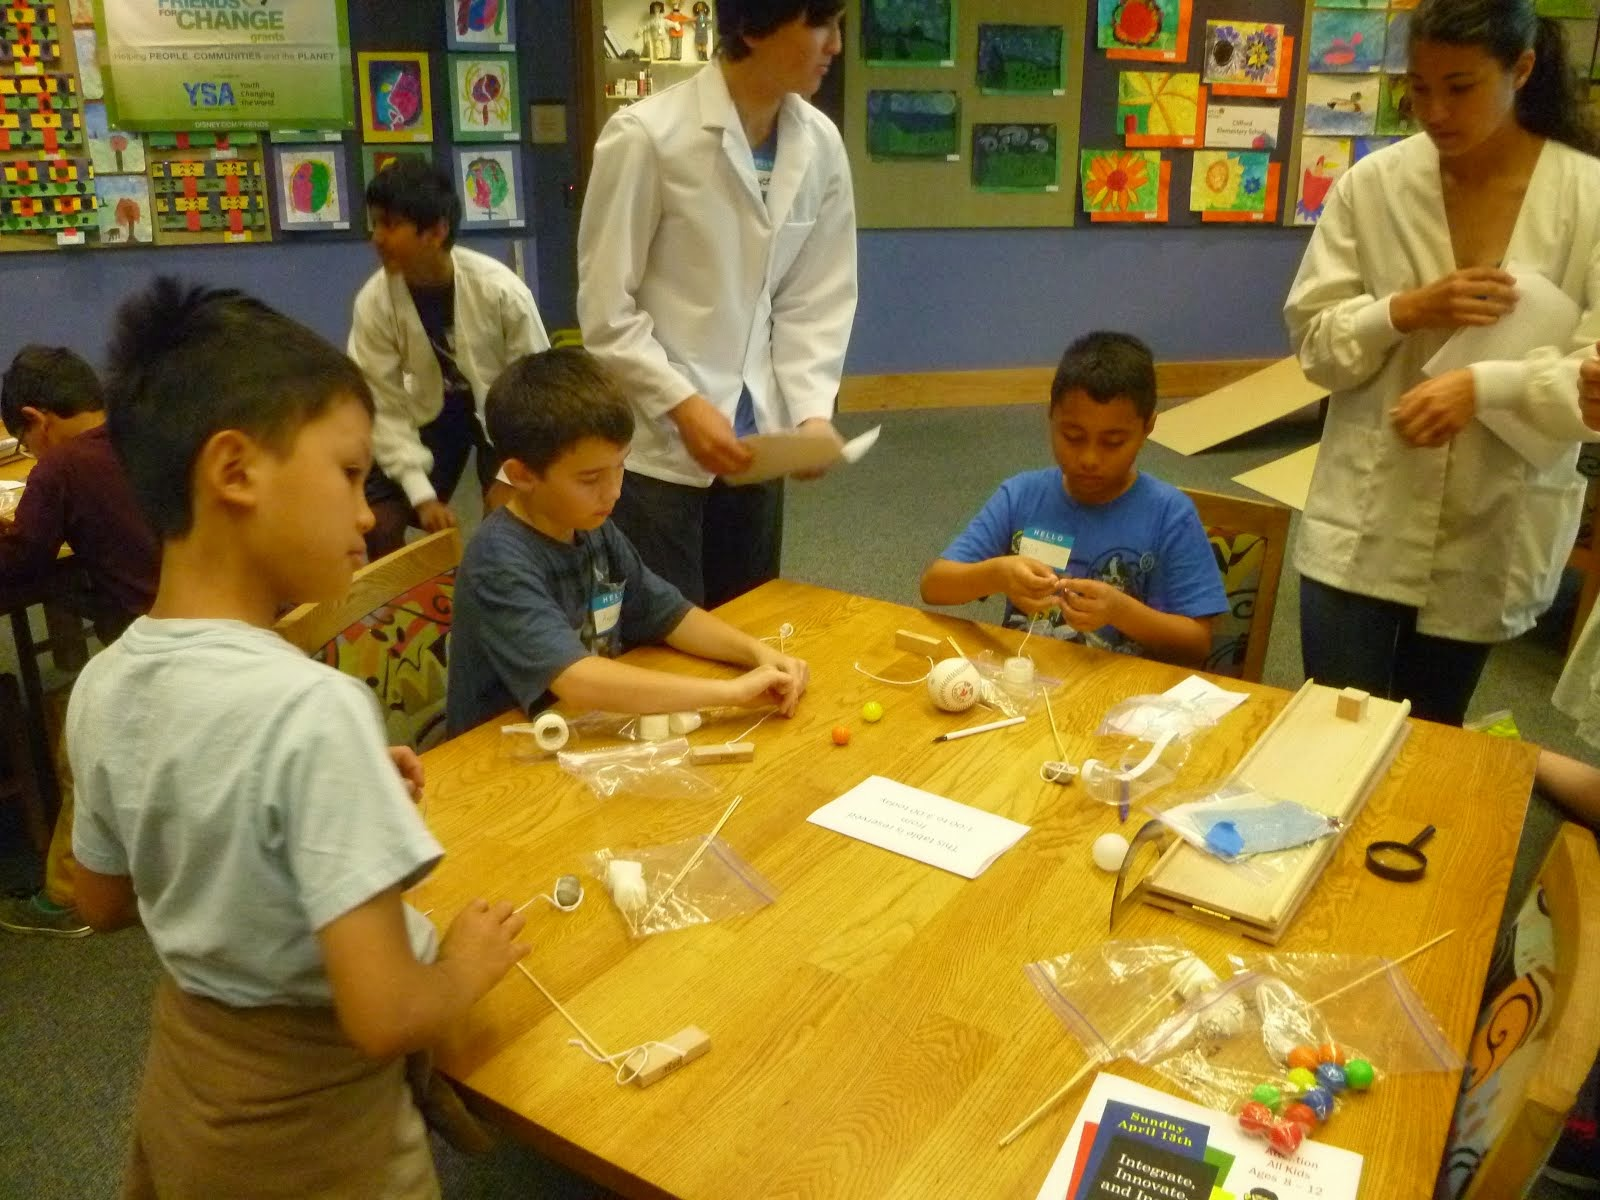 STEM class - helping kids learn through fun experiments